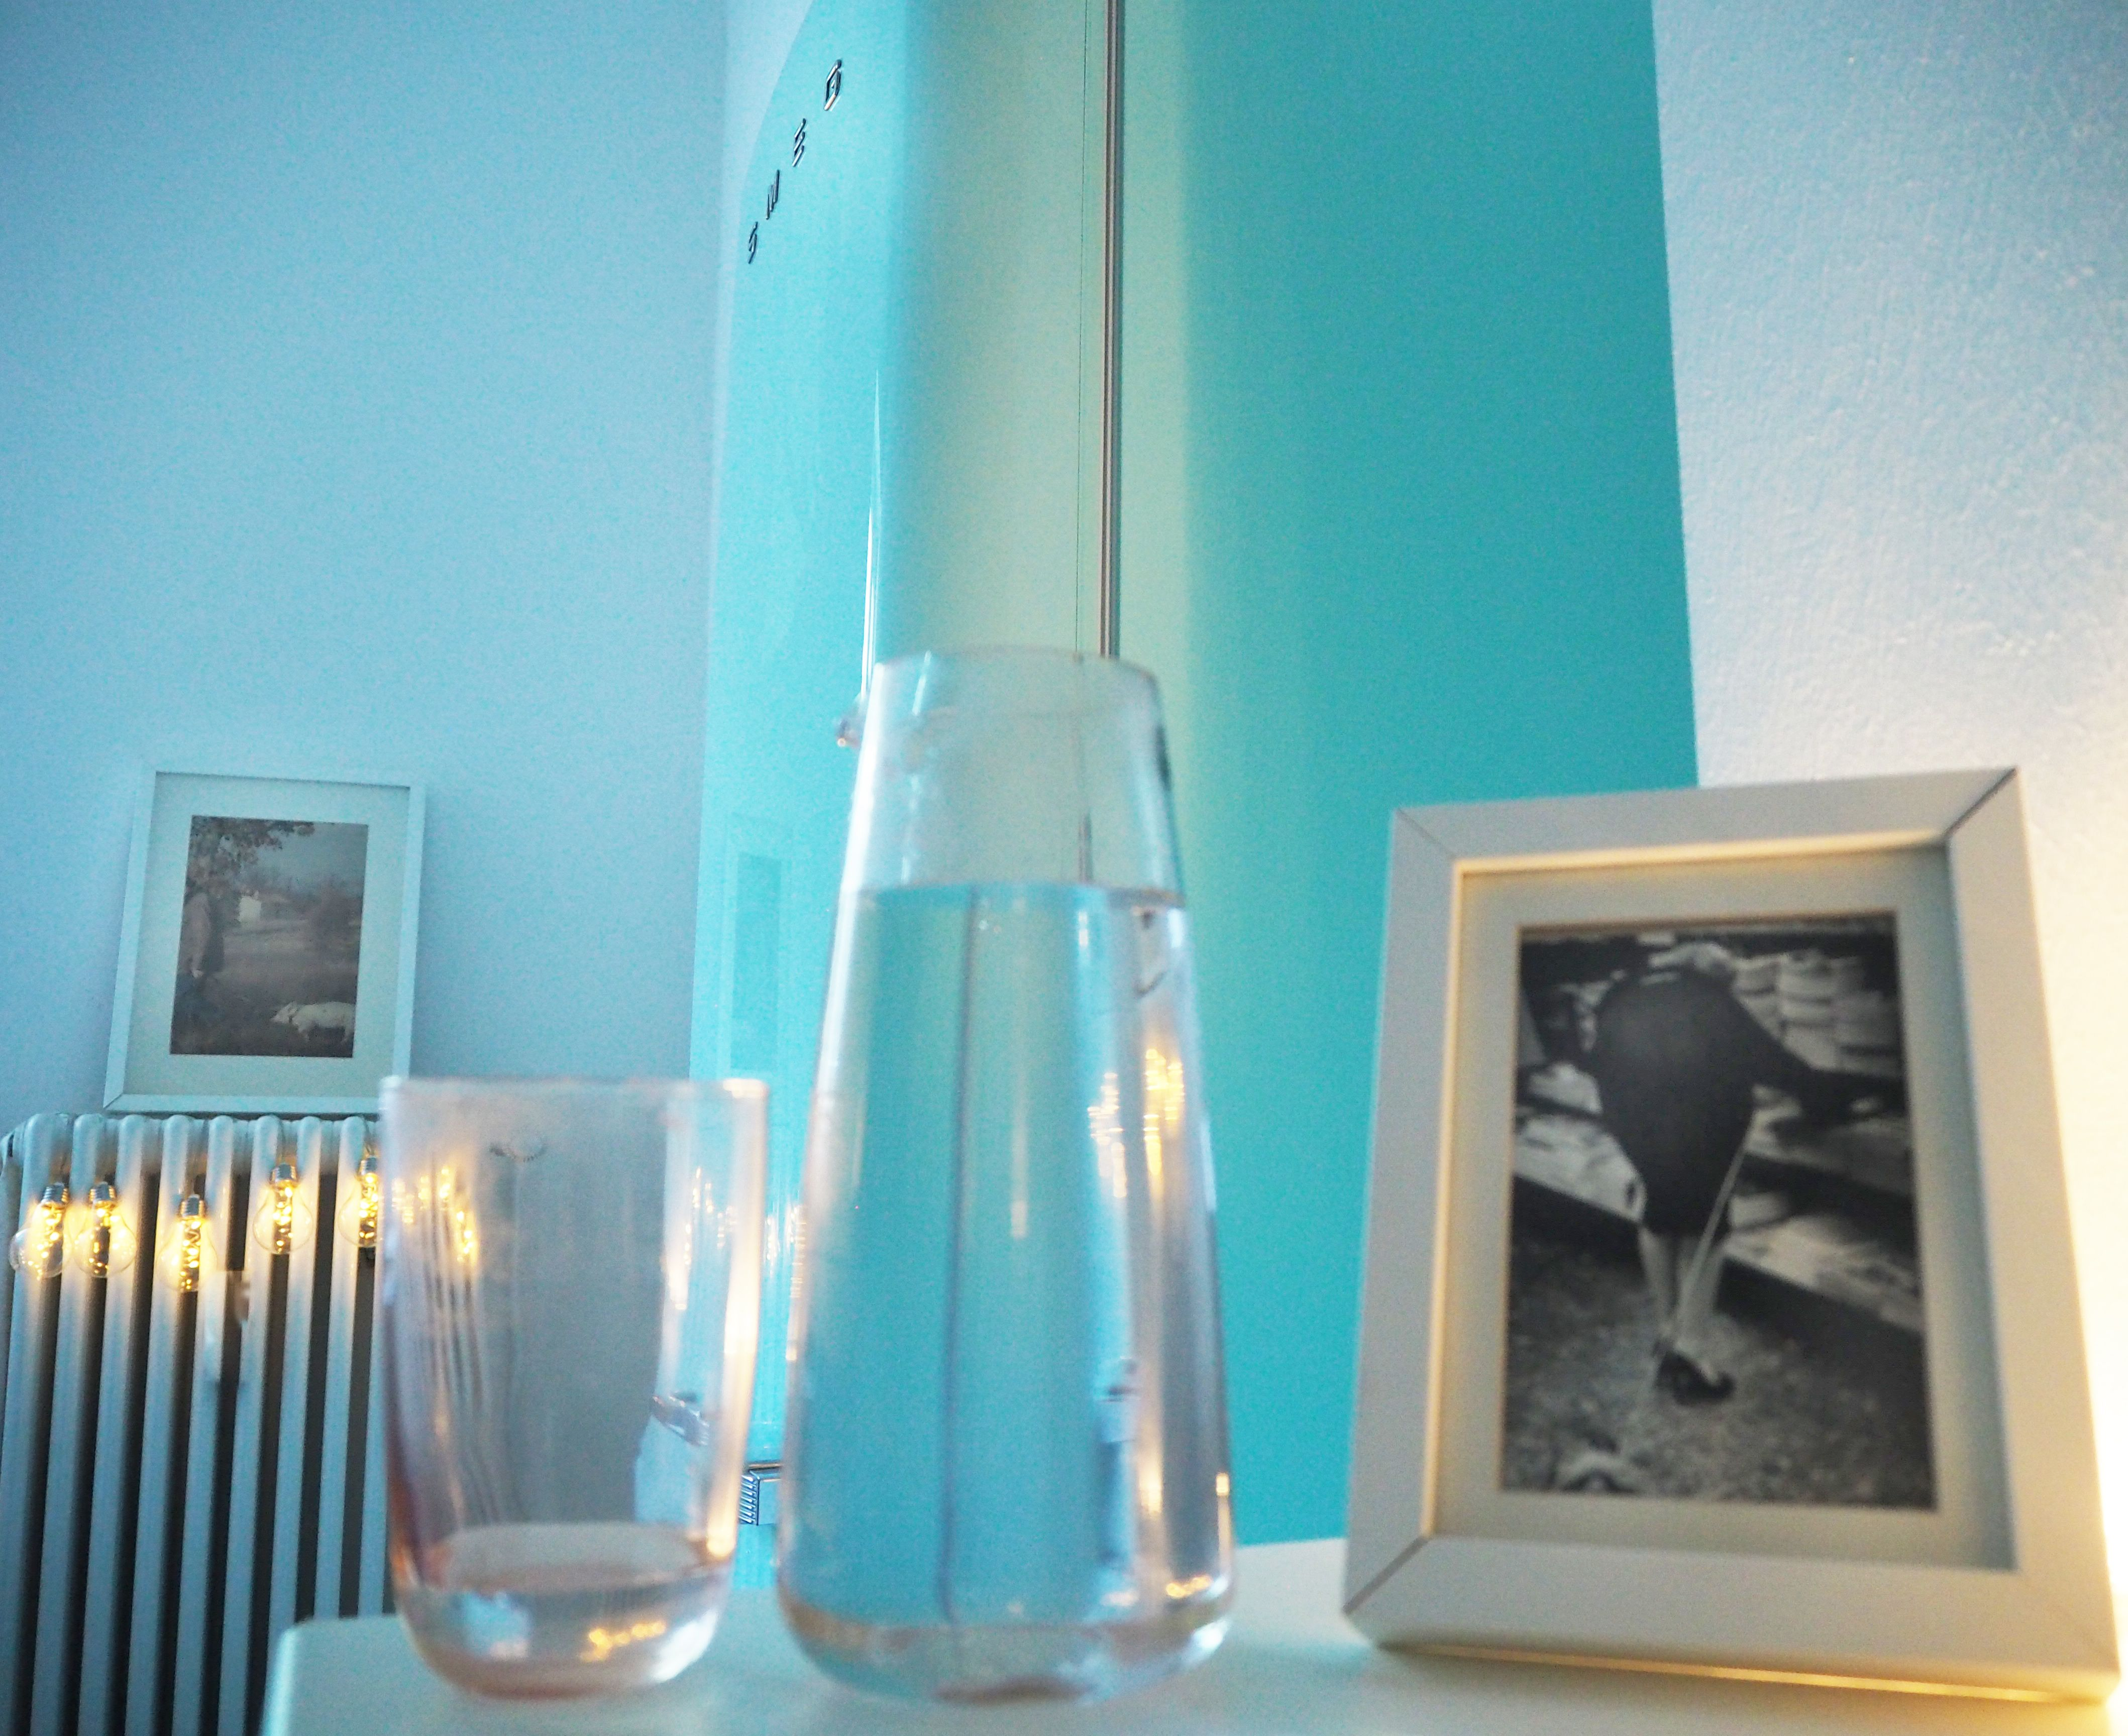 Smeg Kühlschrank Wasser Läuft Aus : Smeg kühlschrank wasser läuft aus sonderaktion zum smeg jubiläum